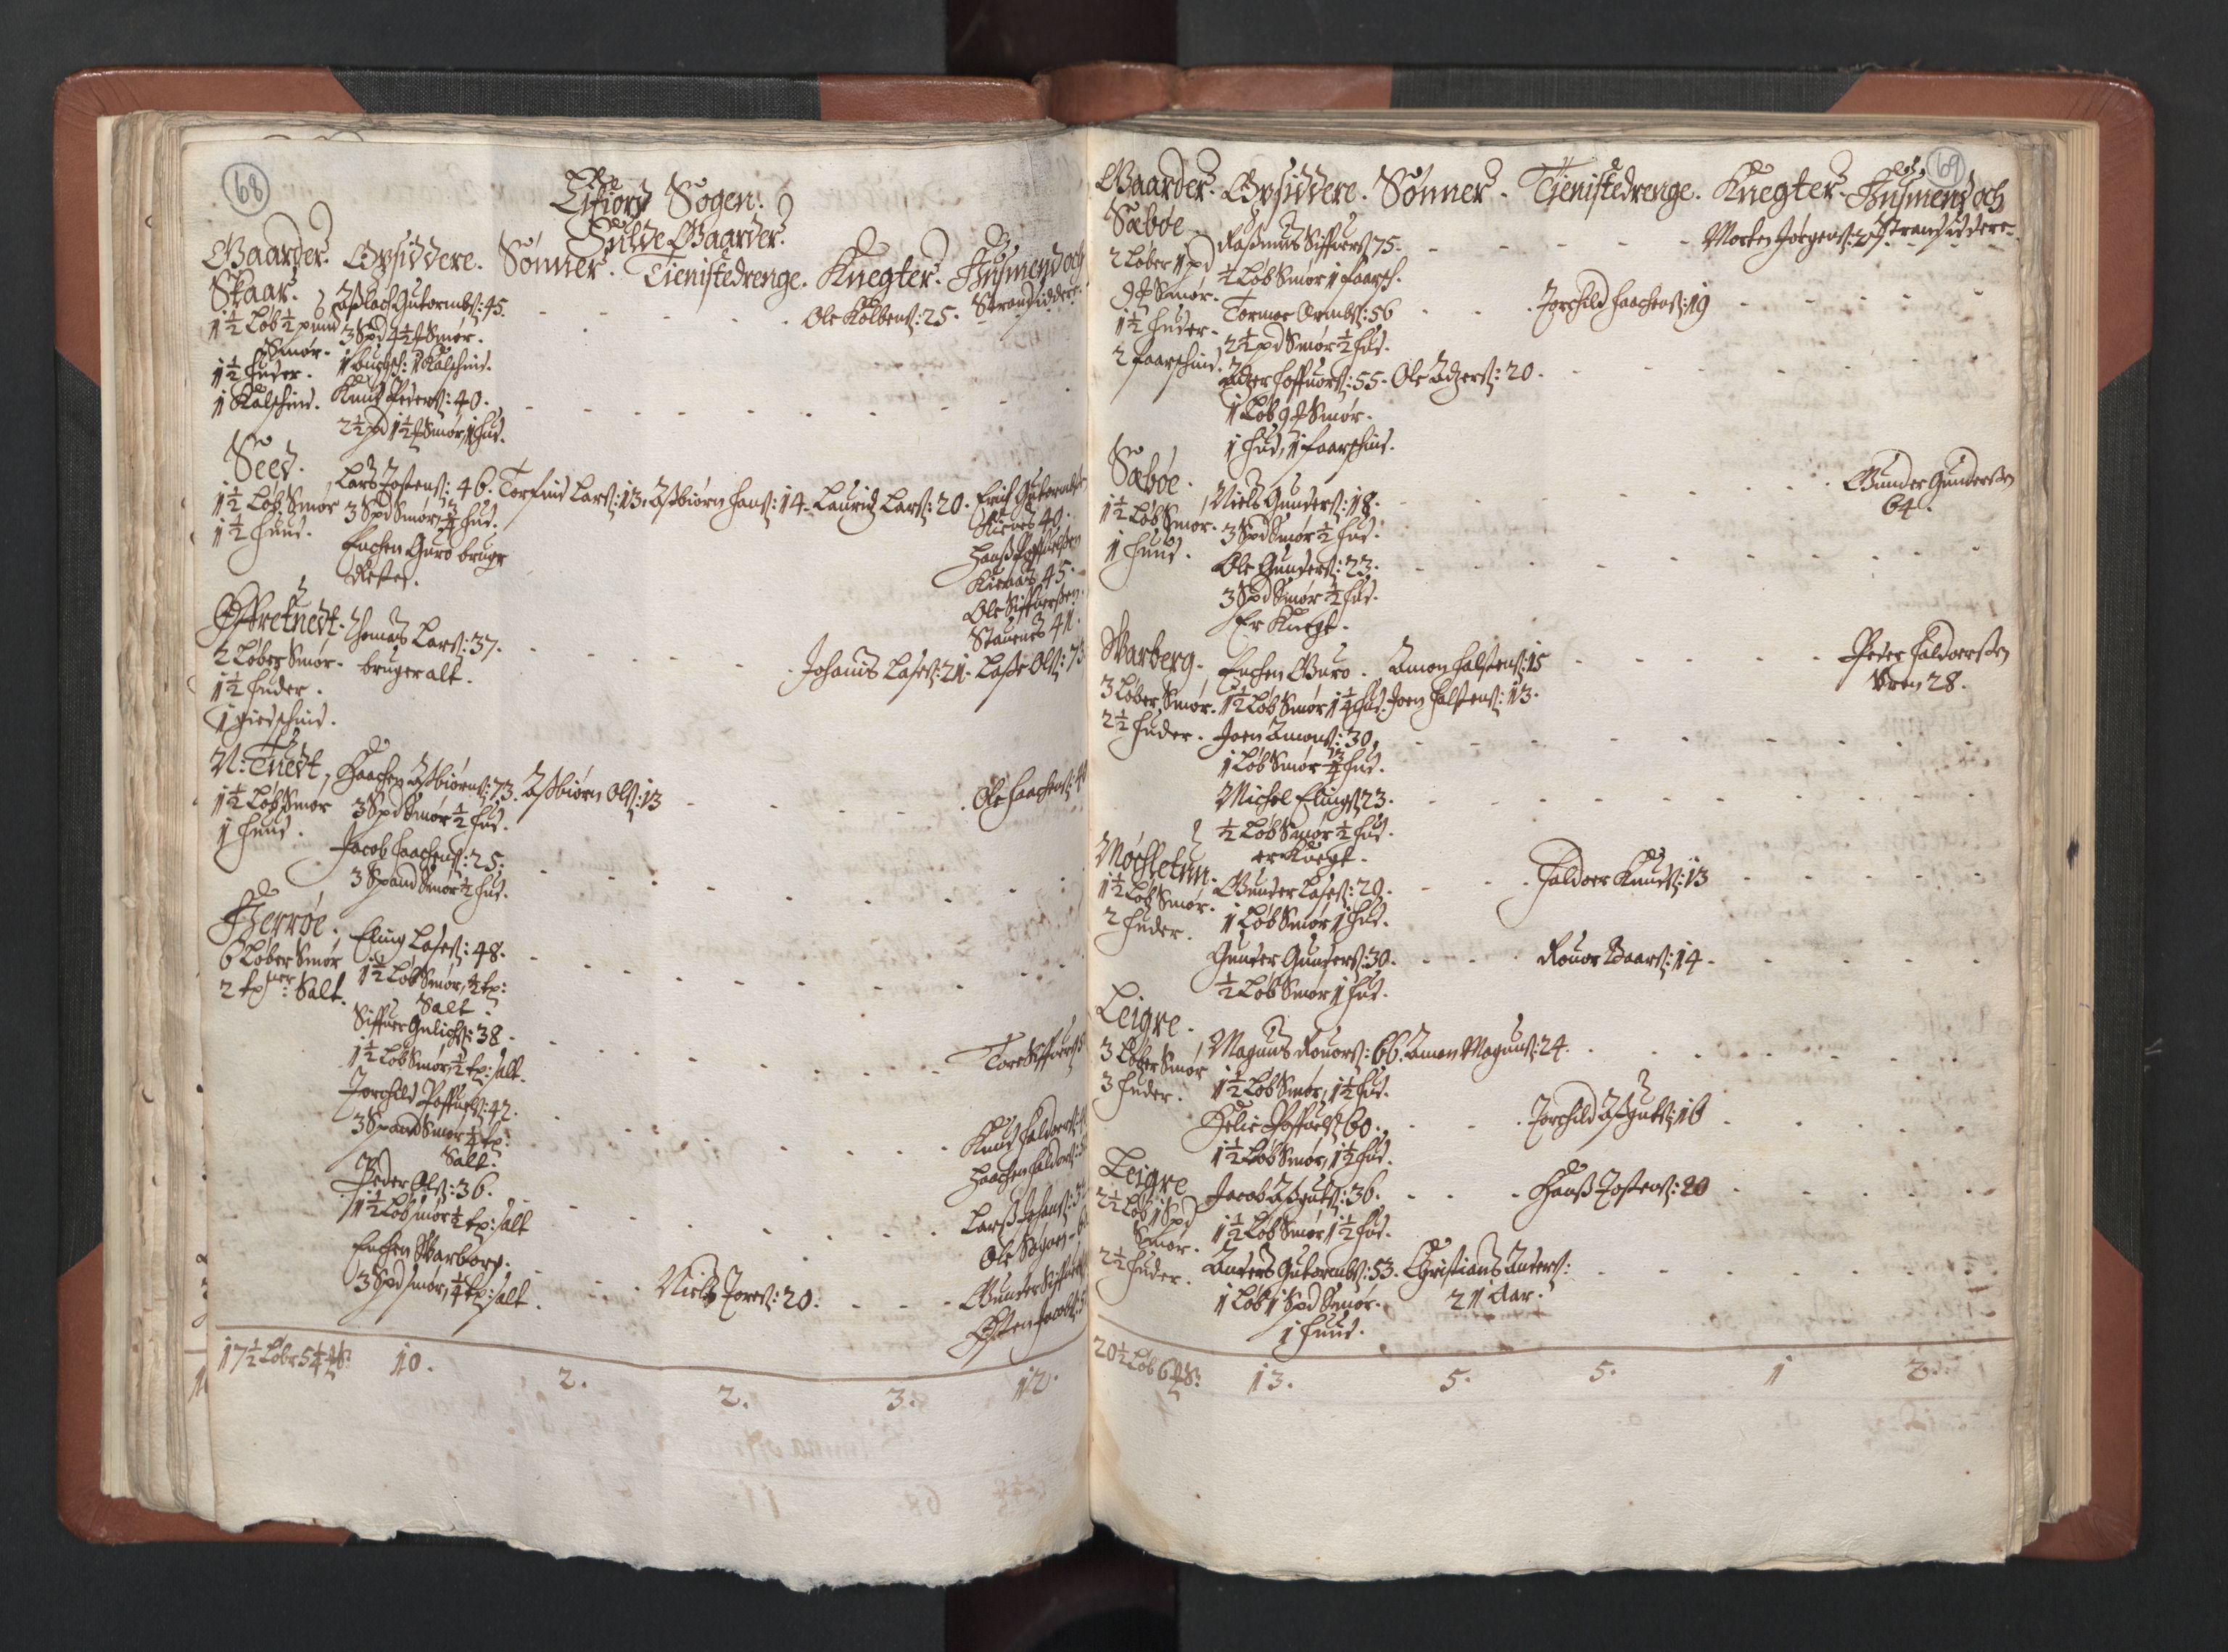 RA, Fogdenes og sorenskrivernes manntall 1664-1666, nr. 14: Hardanger len, Ytre Sogn fogderi og Indre Sogn fogderi, 1664-1665, s. 68-69